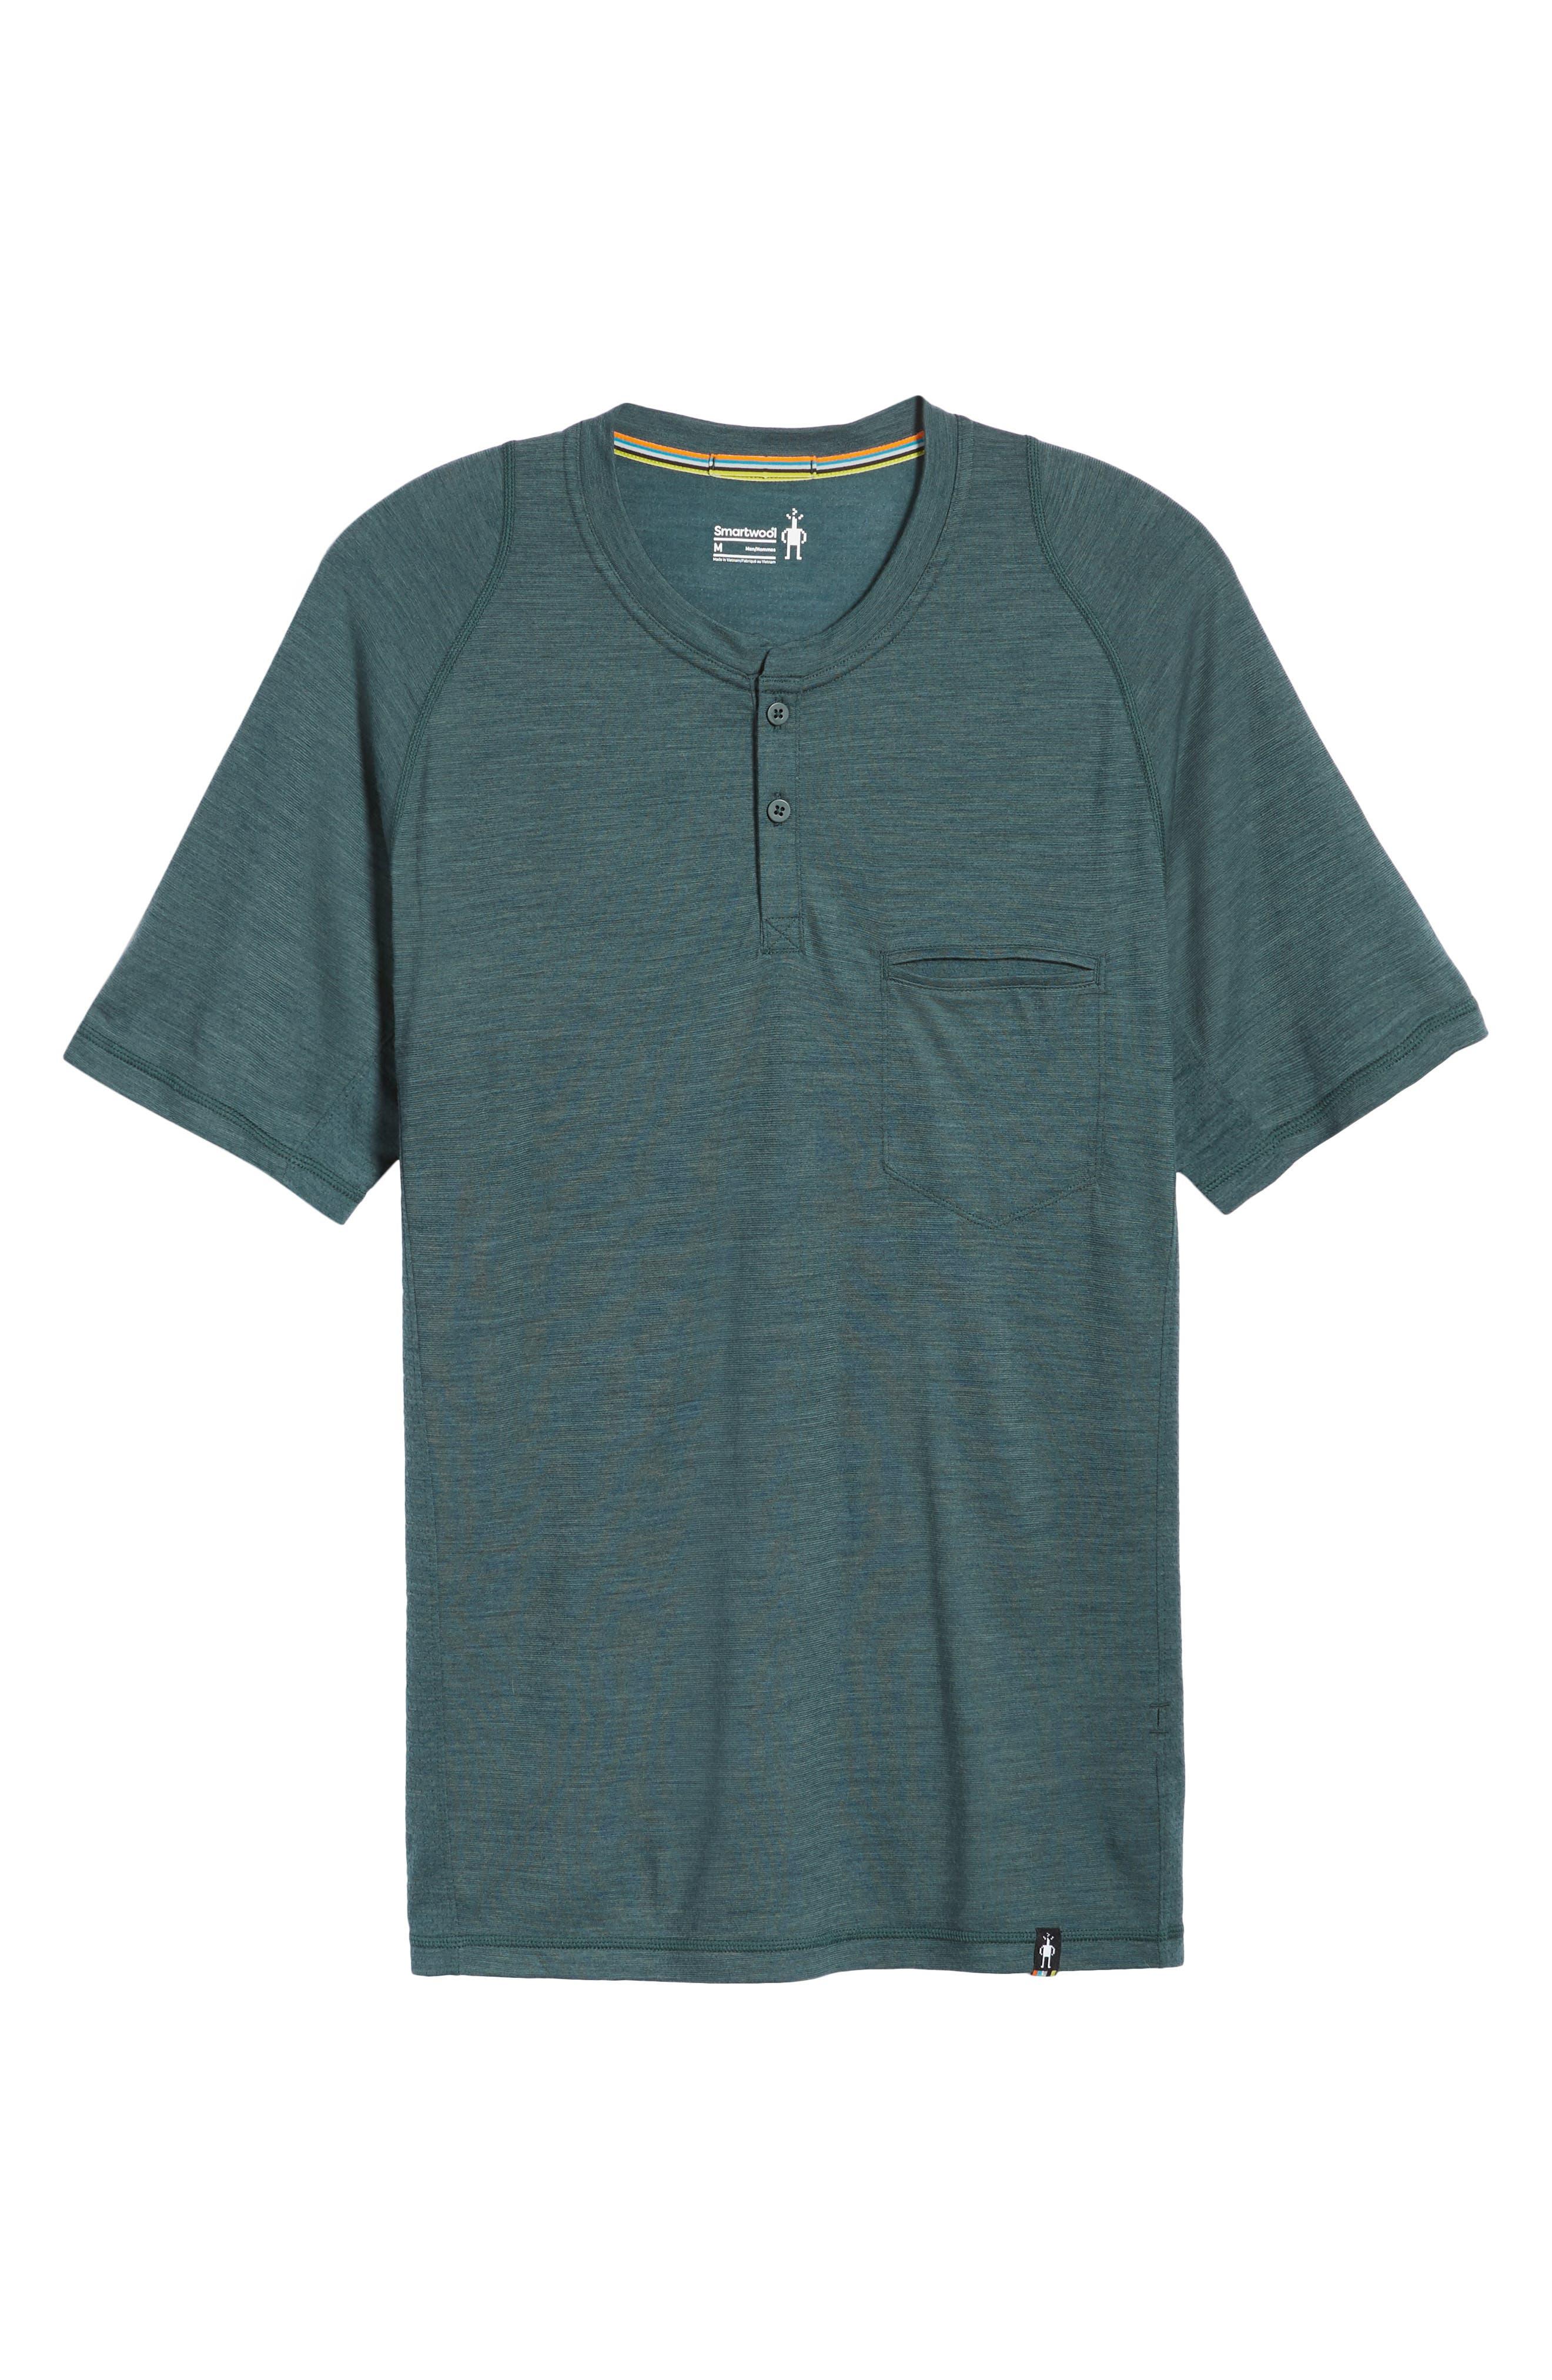 Everyday Exploration Short Sleeve Henley,                         Main,                         color, Midnight Green